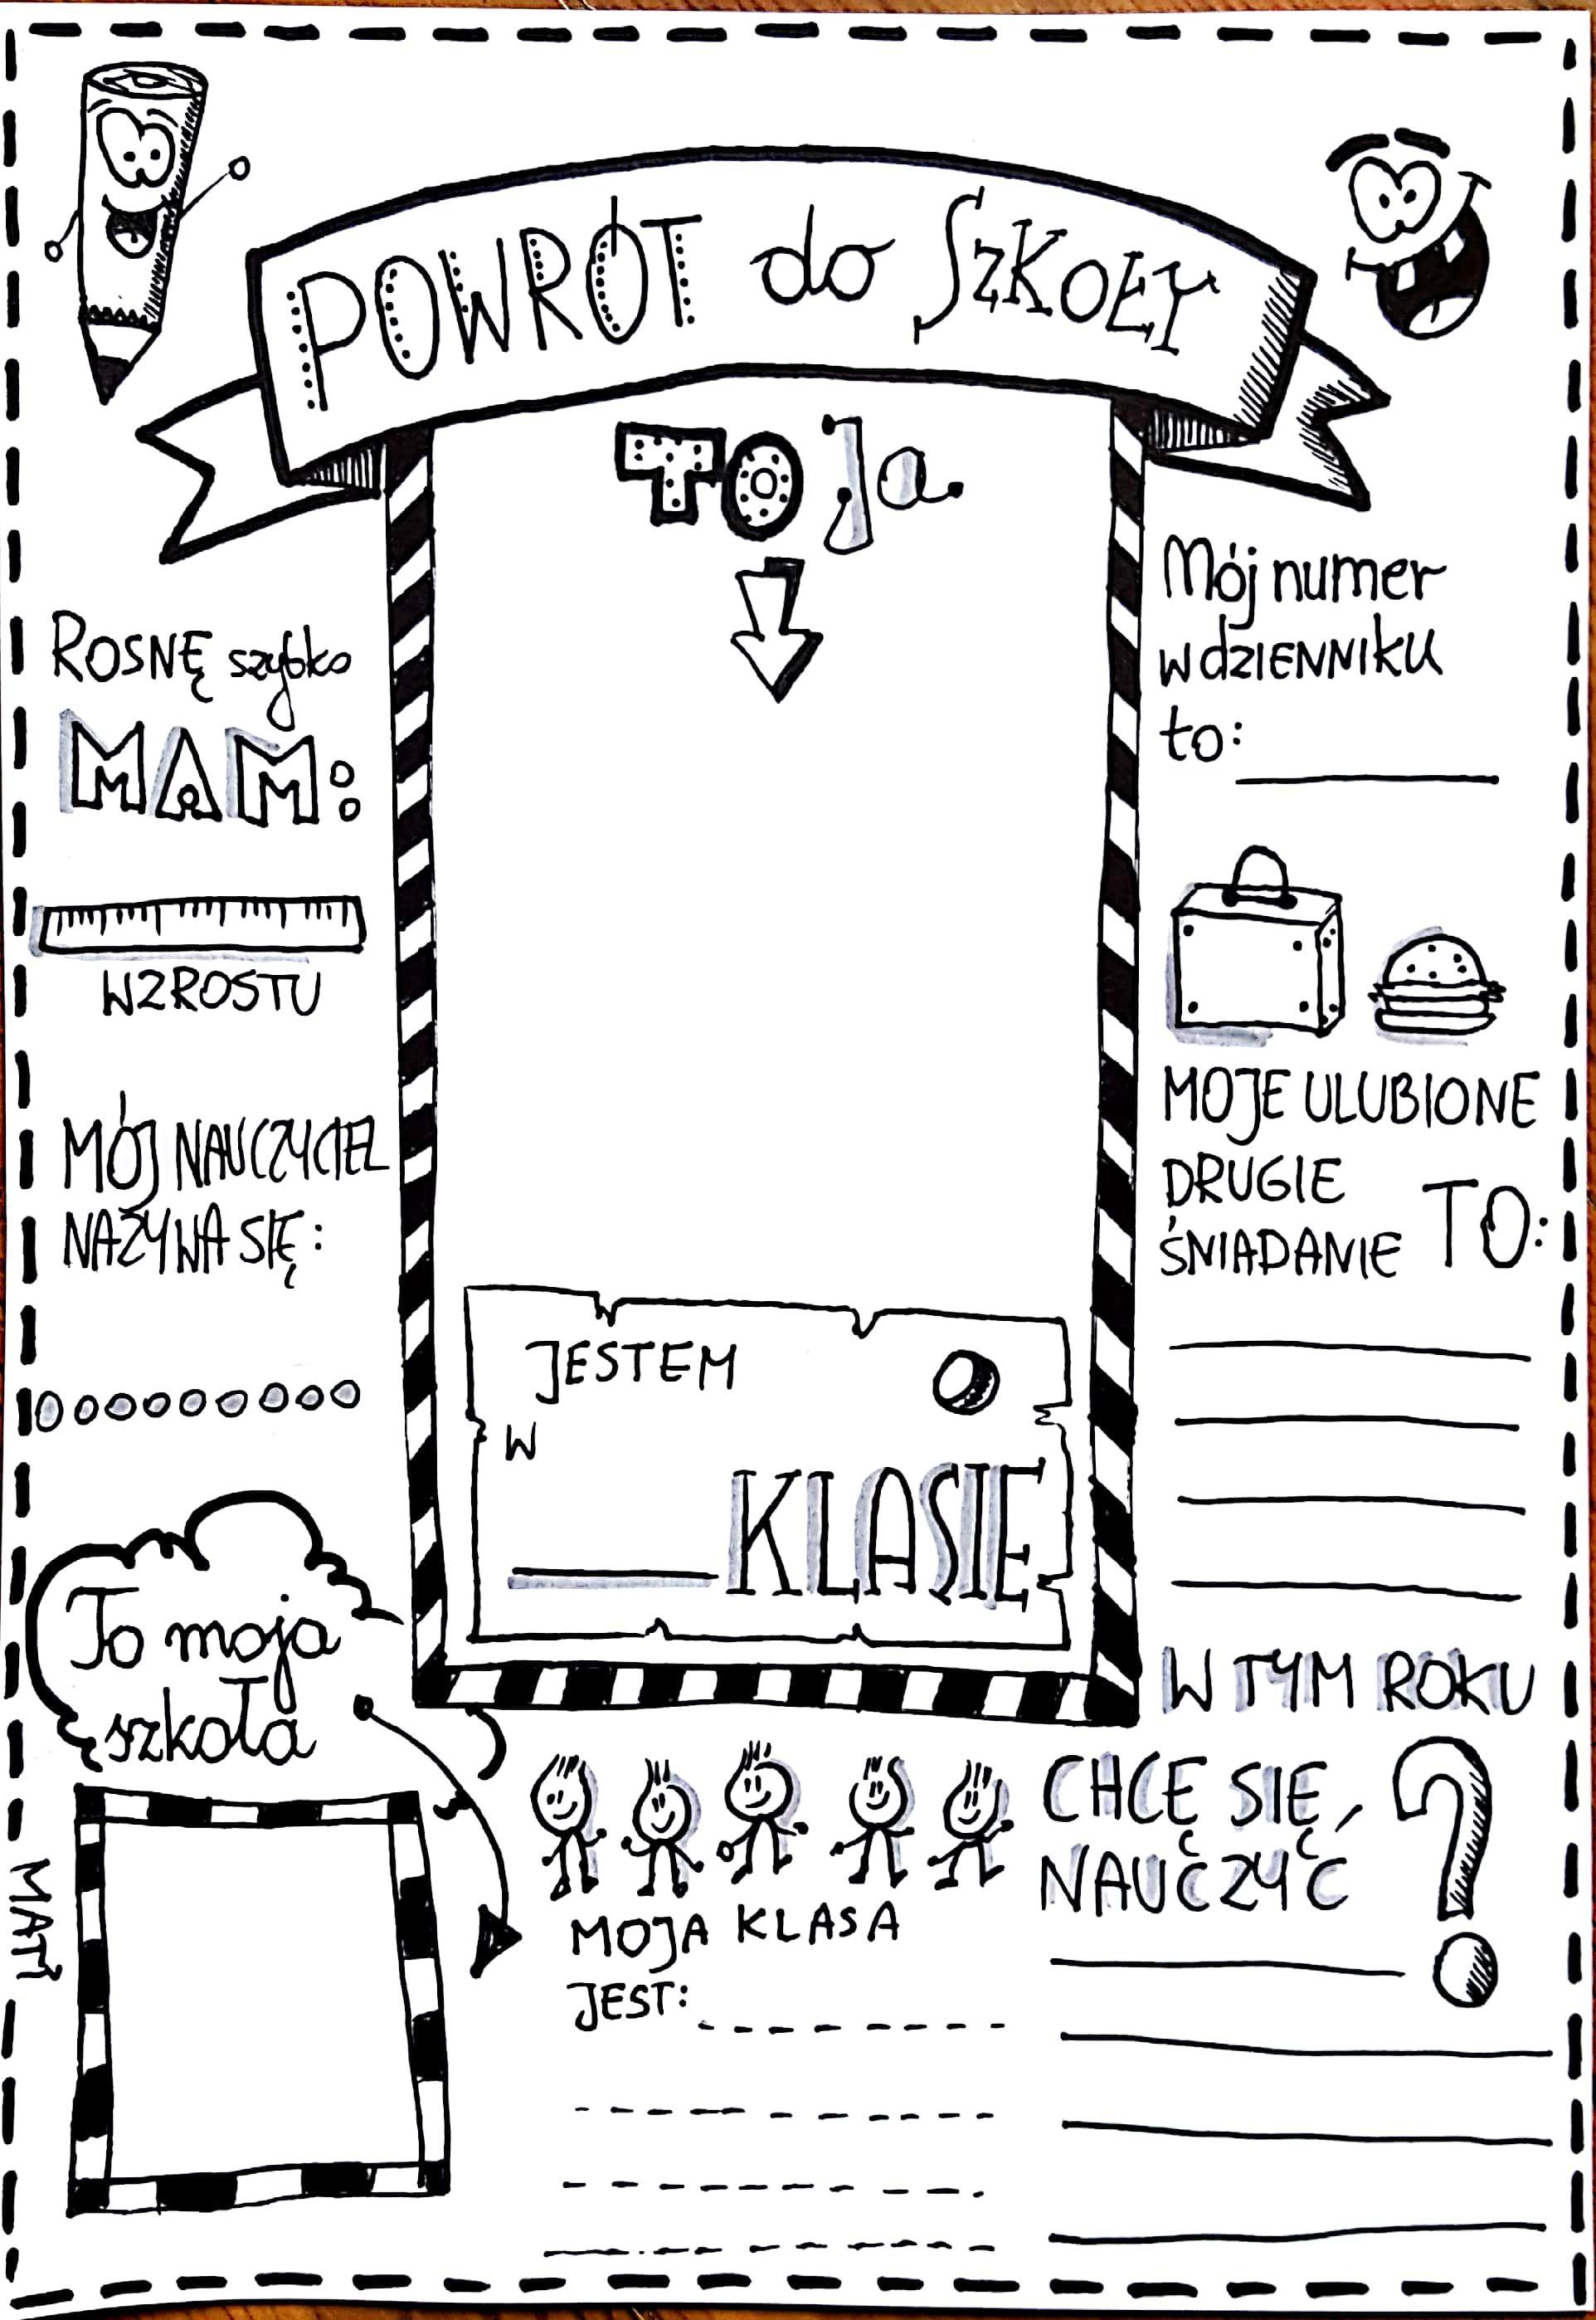 Pin By Monika Smykowska On Ocenianie Ksztaltujace Polish Language Teacher Morale Early Education